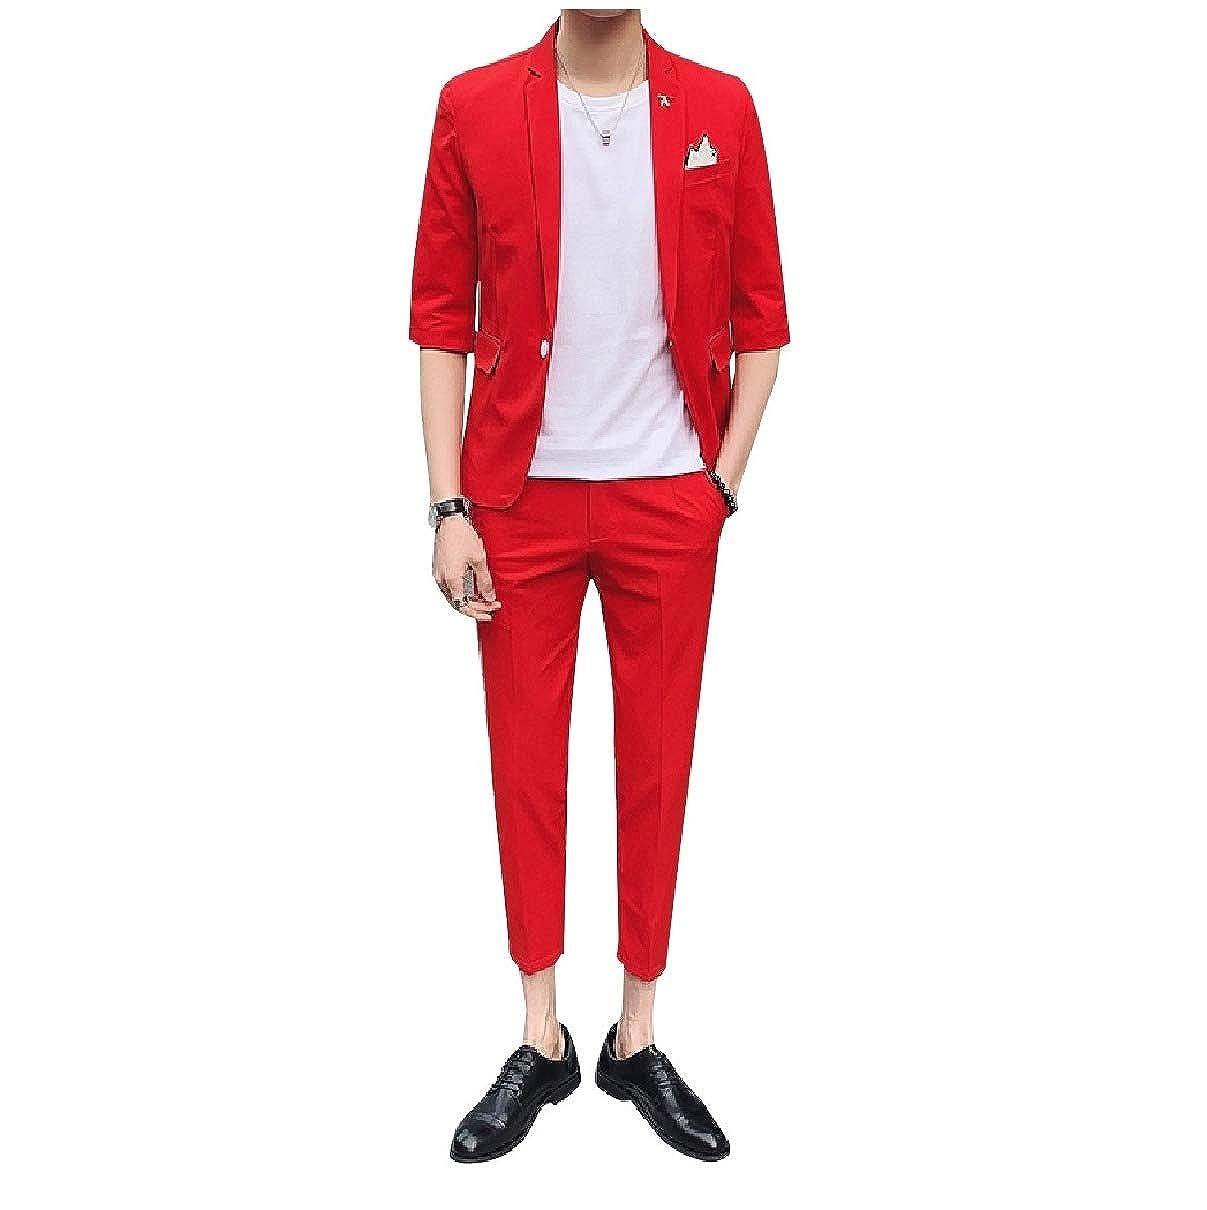 Coolred-Men Short-Sleeve Slimming 2-Piece Suit Jacket /& Pleated Pants Set